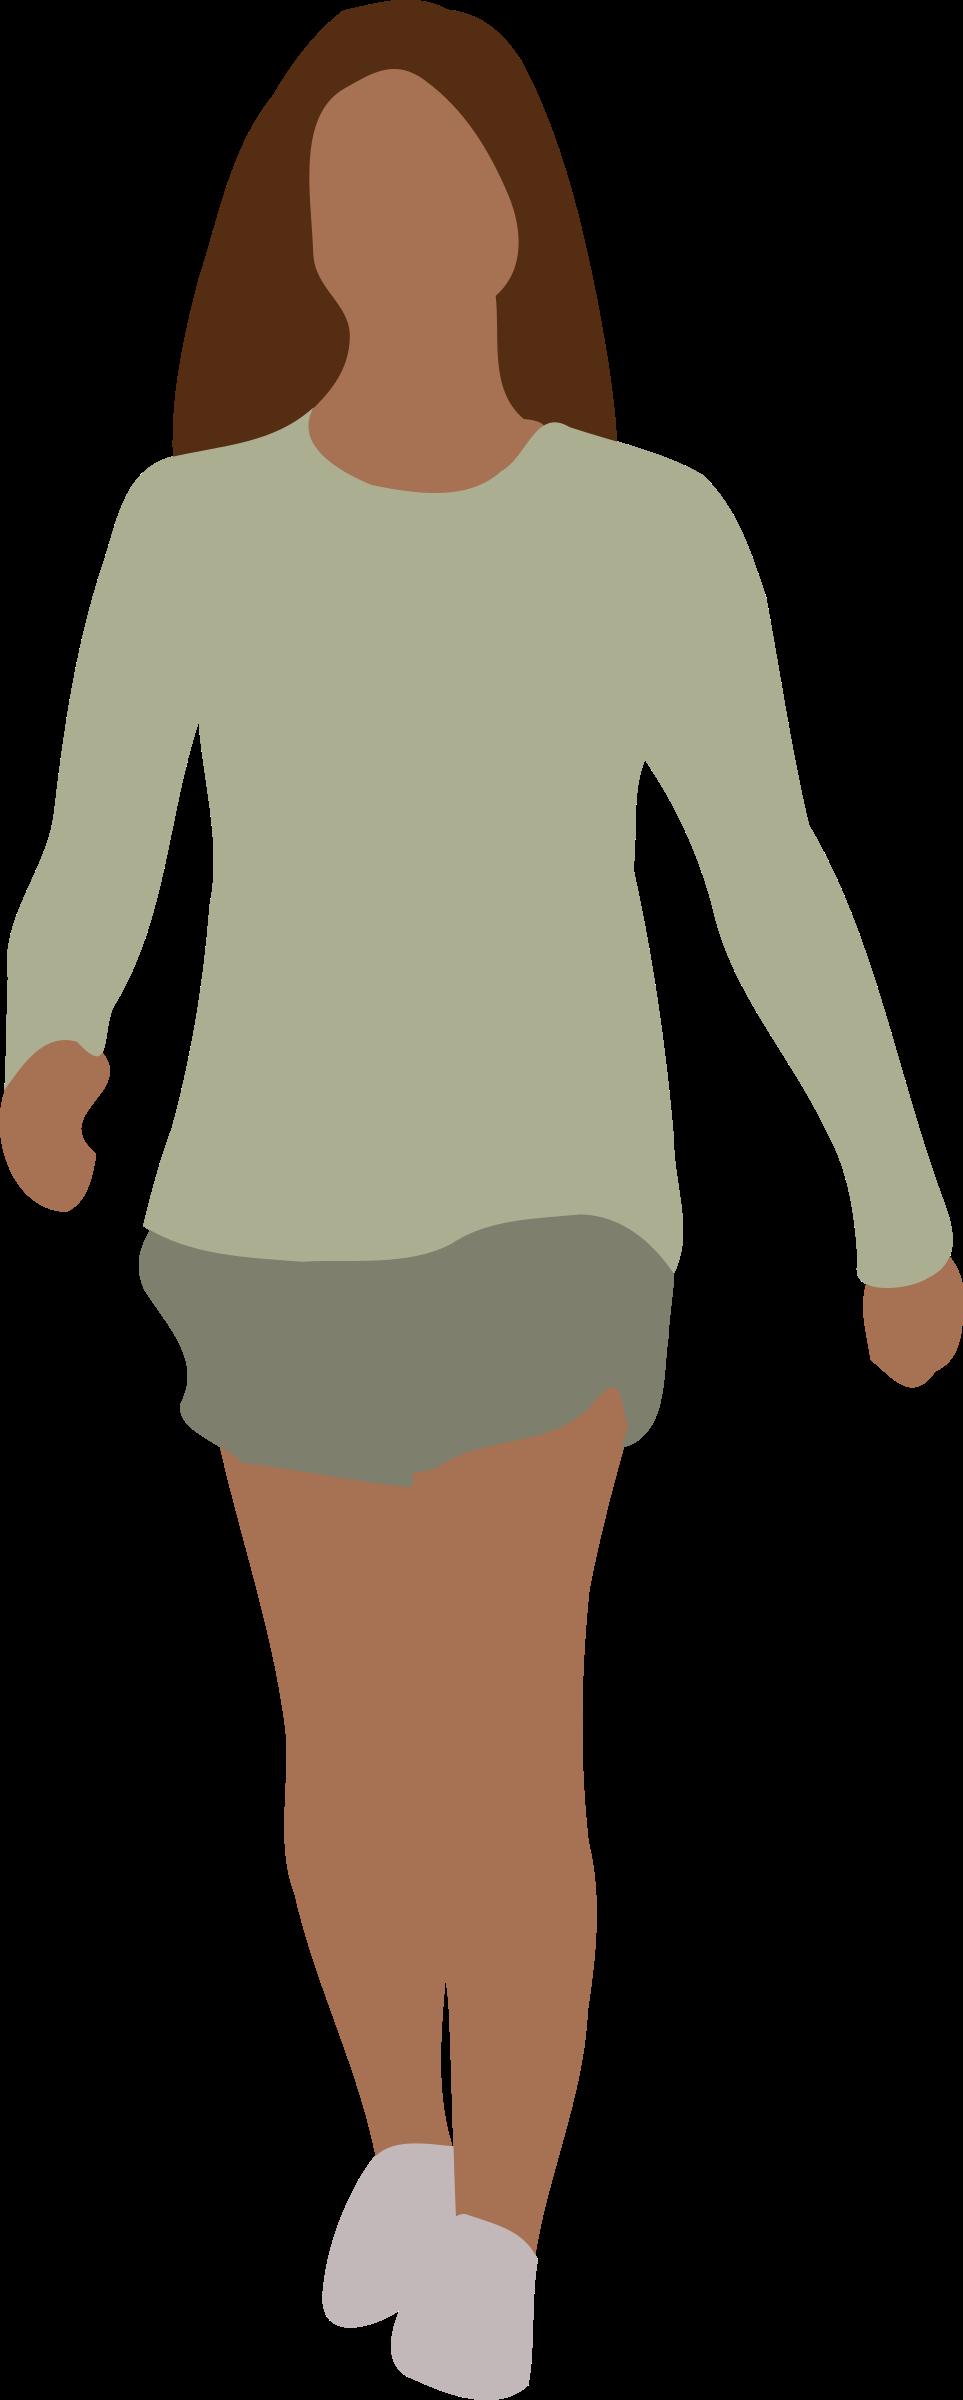 Faceless woman big image. Clipart walking female walking